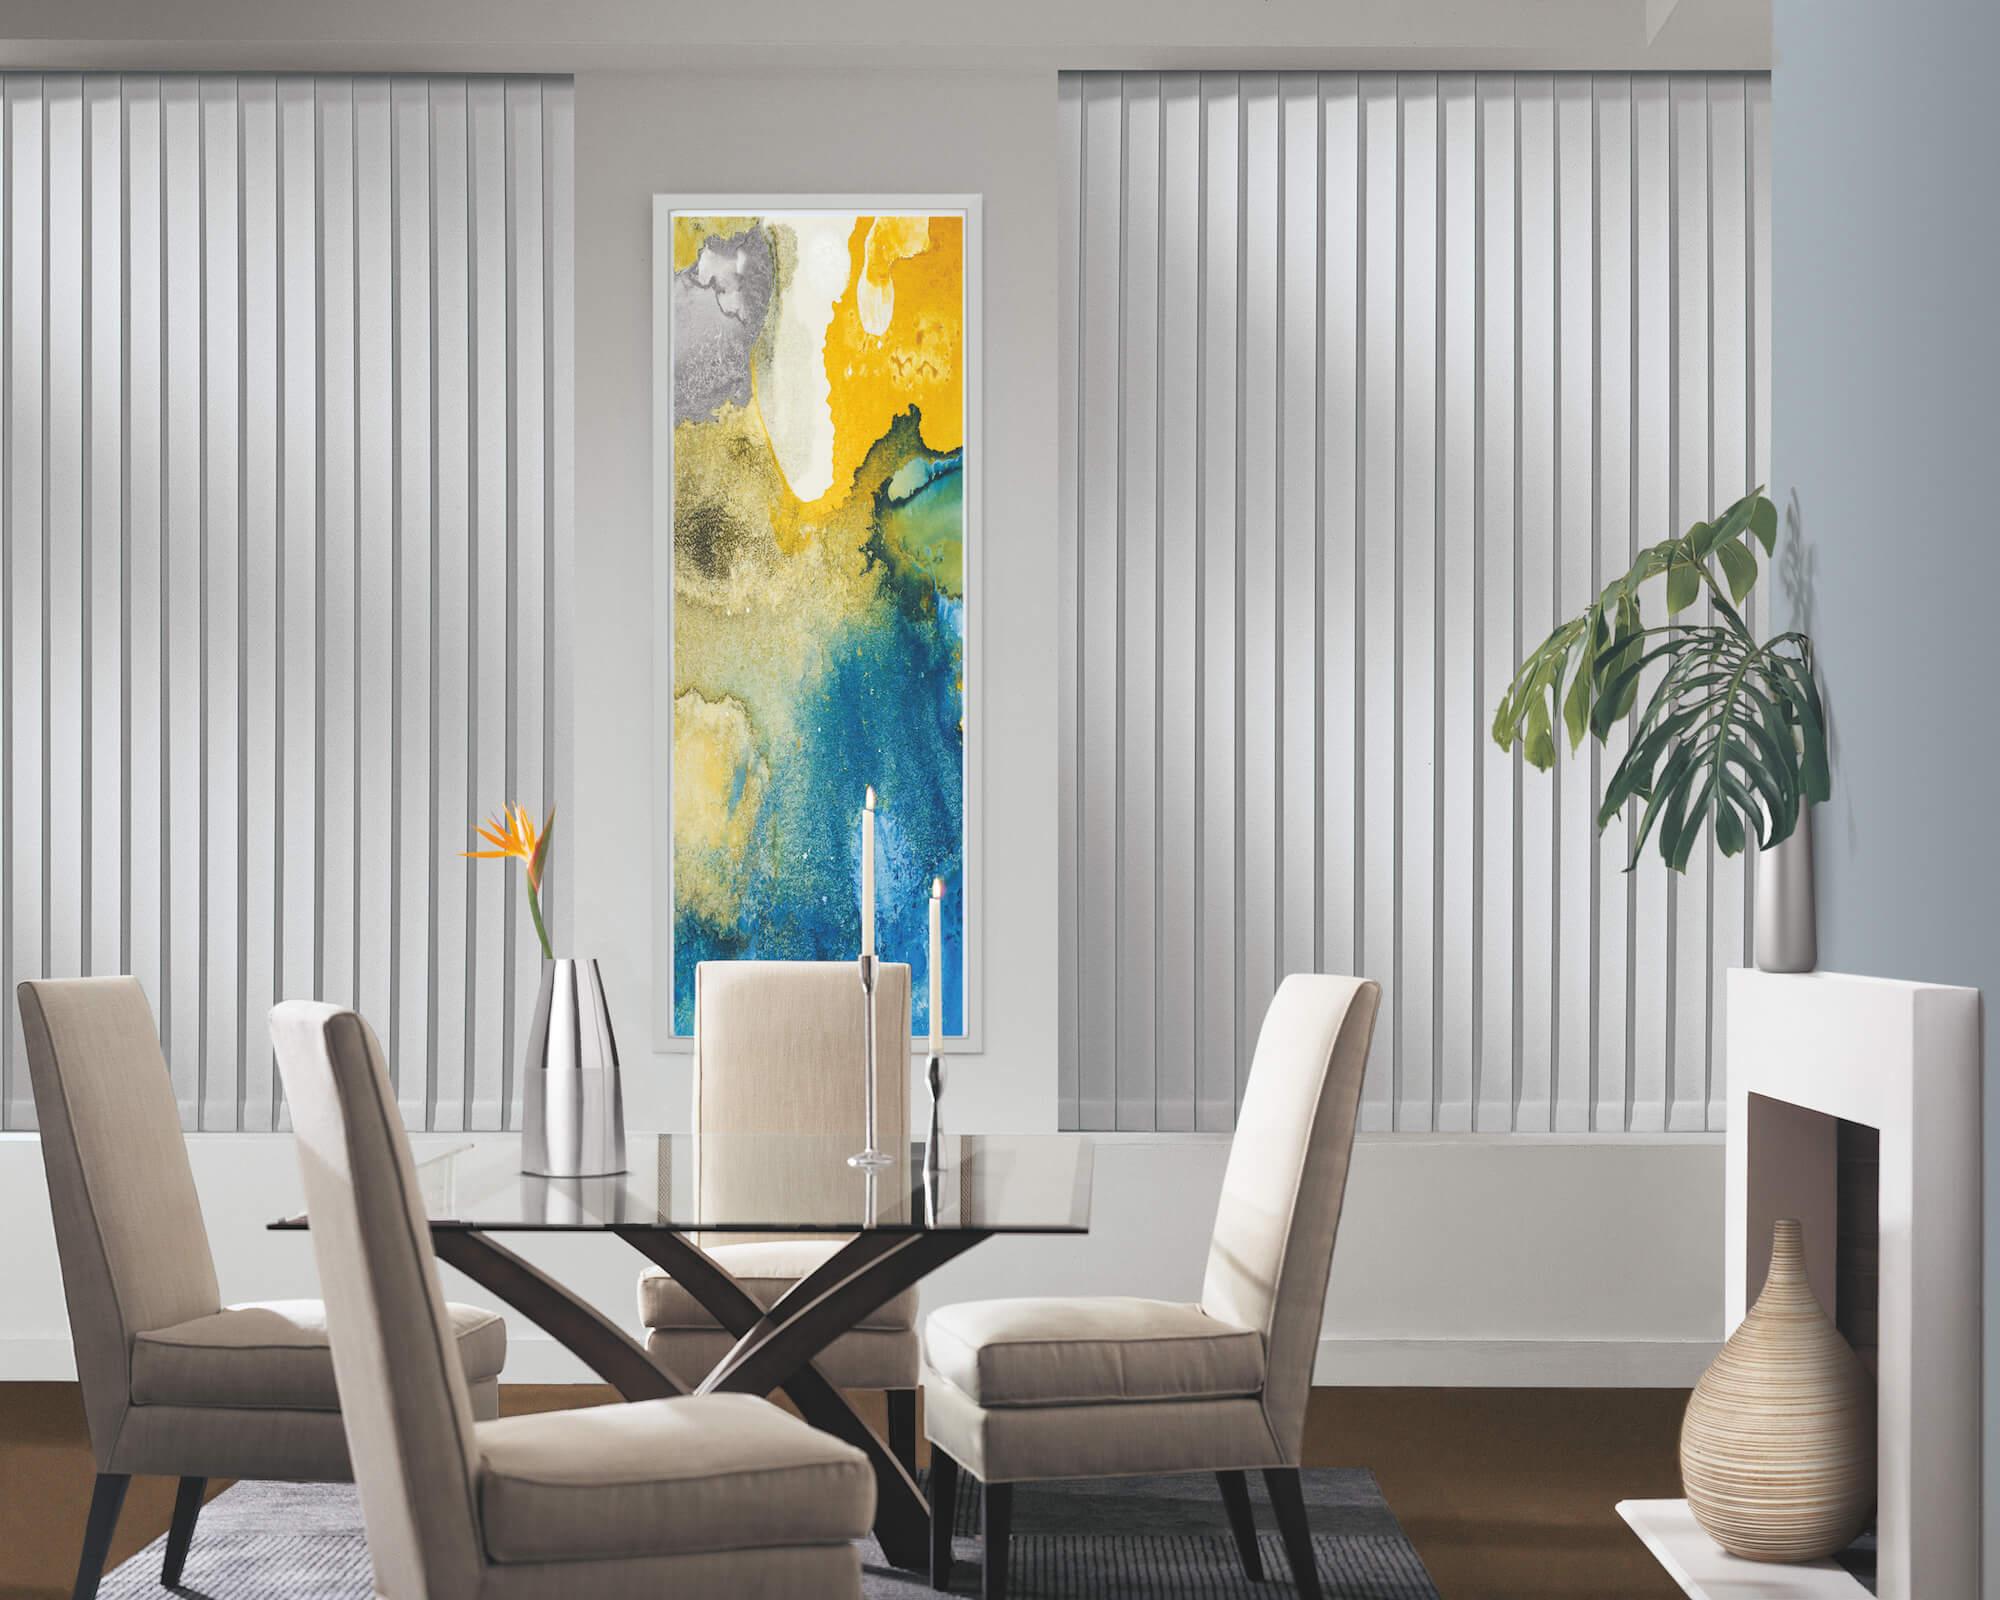 Somner Custom Vertical Blinds closed behind dining room table